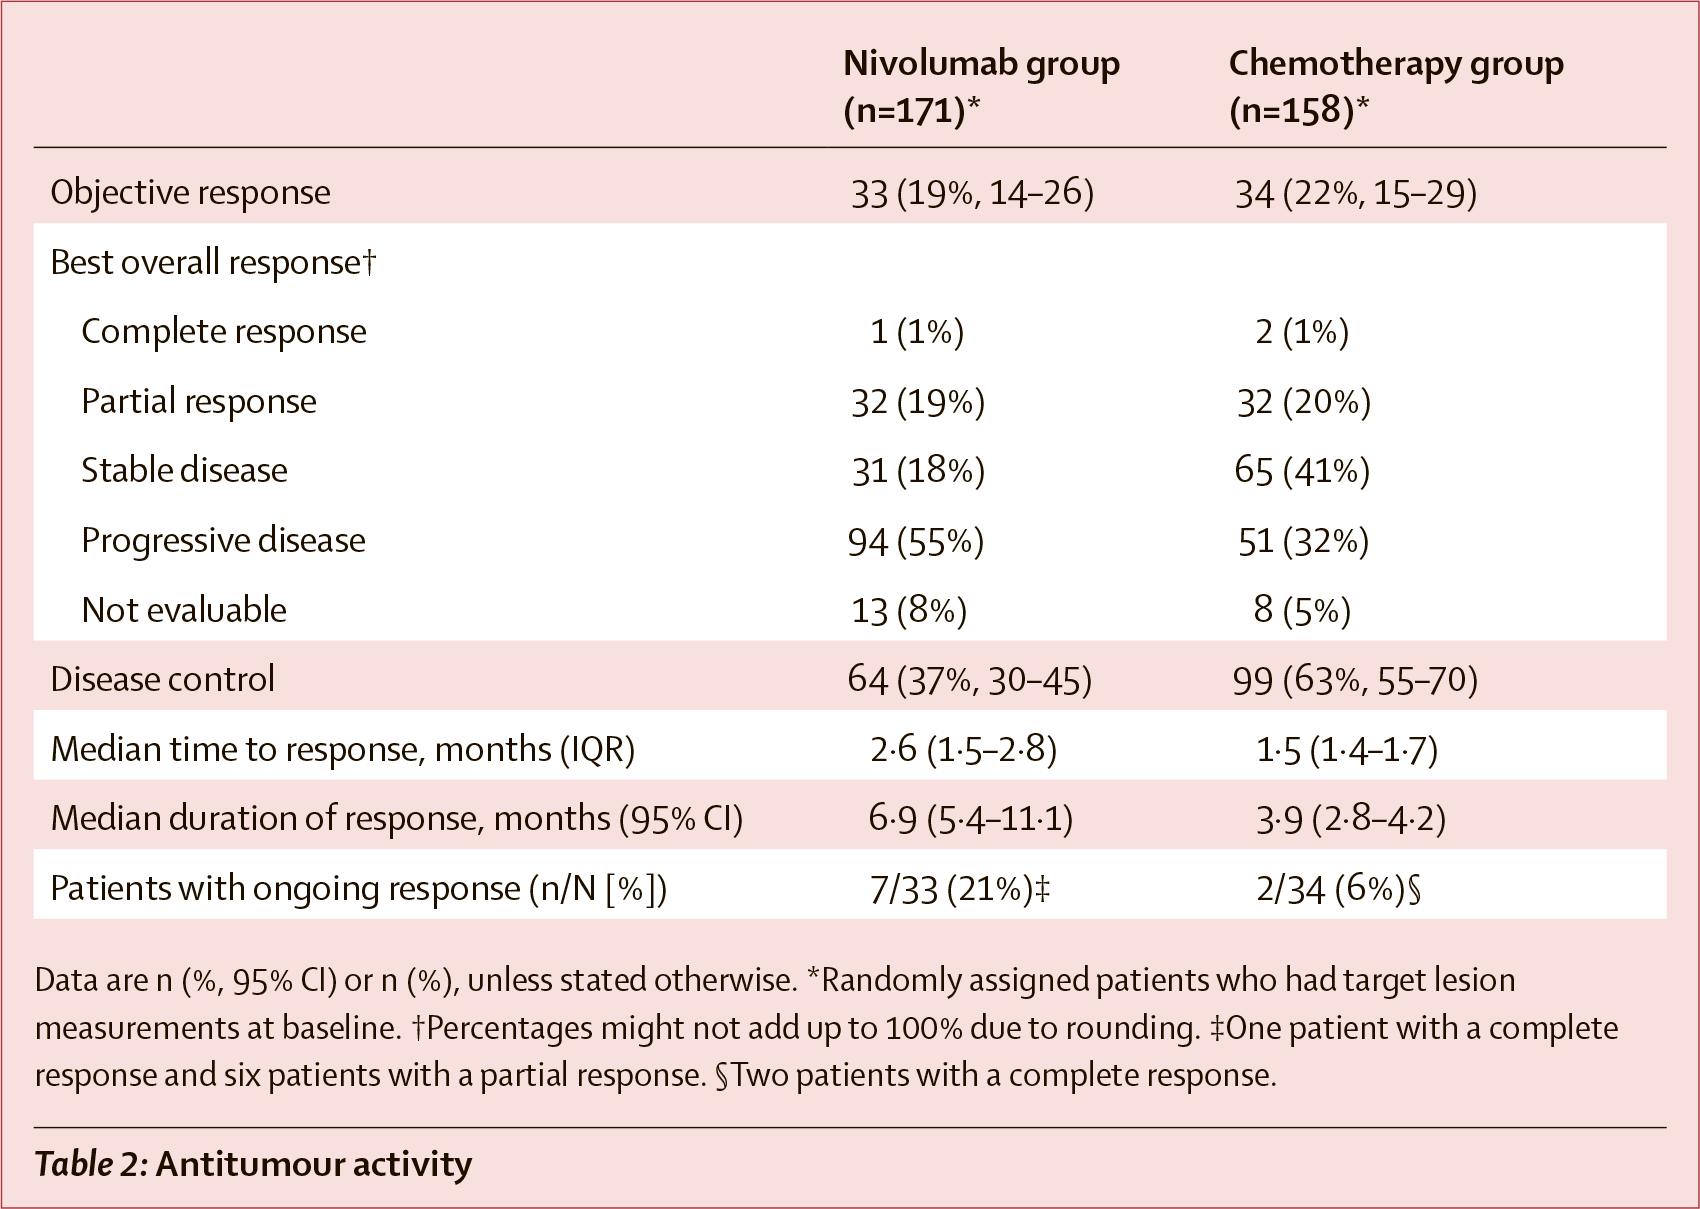 nct02569242 results 03 - Рак пищевода: назначайте «Опдиво» вместо химиотерапии